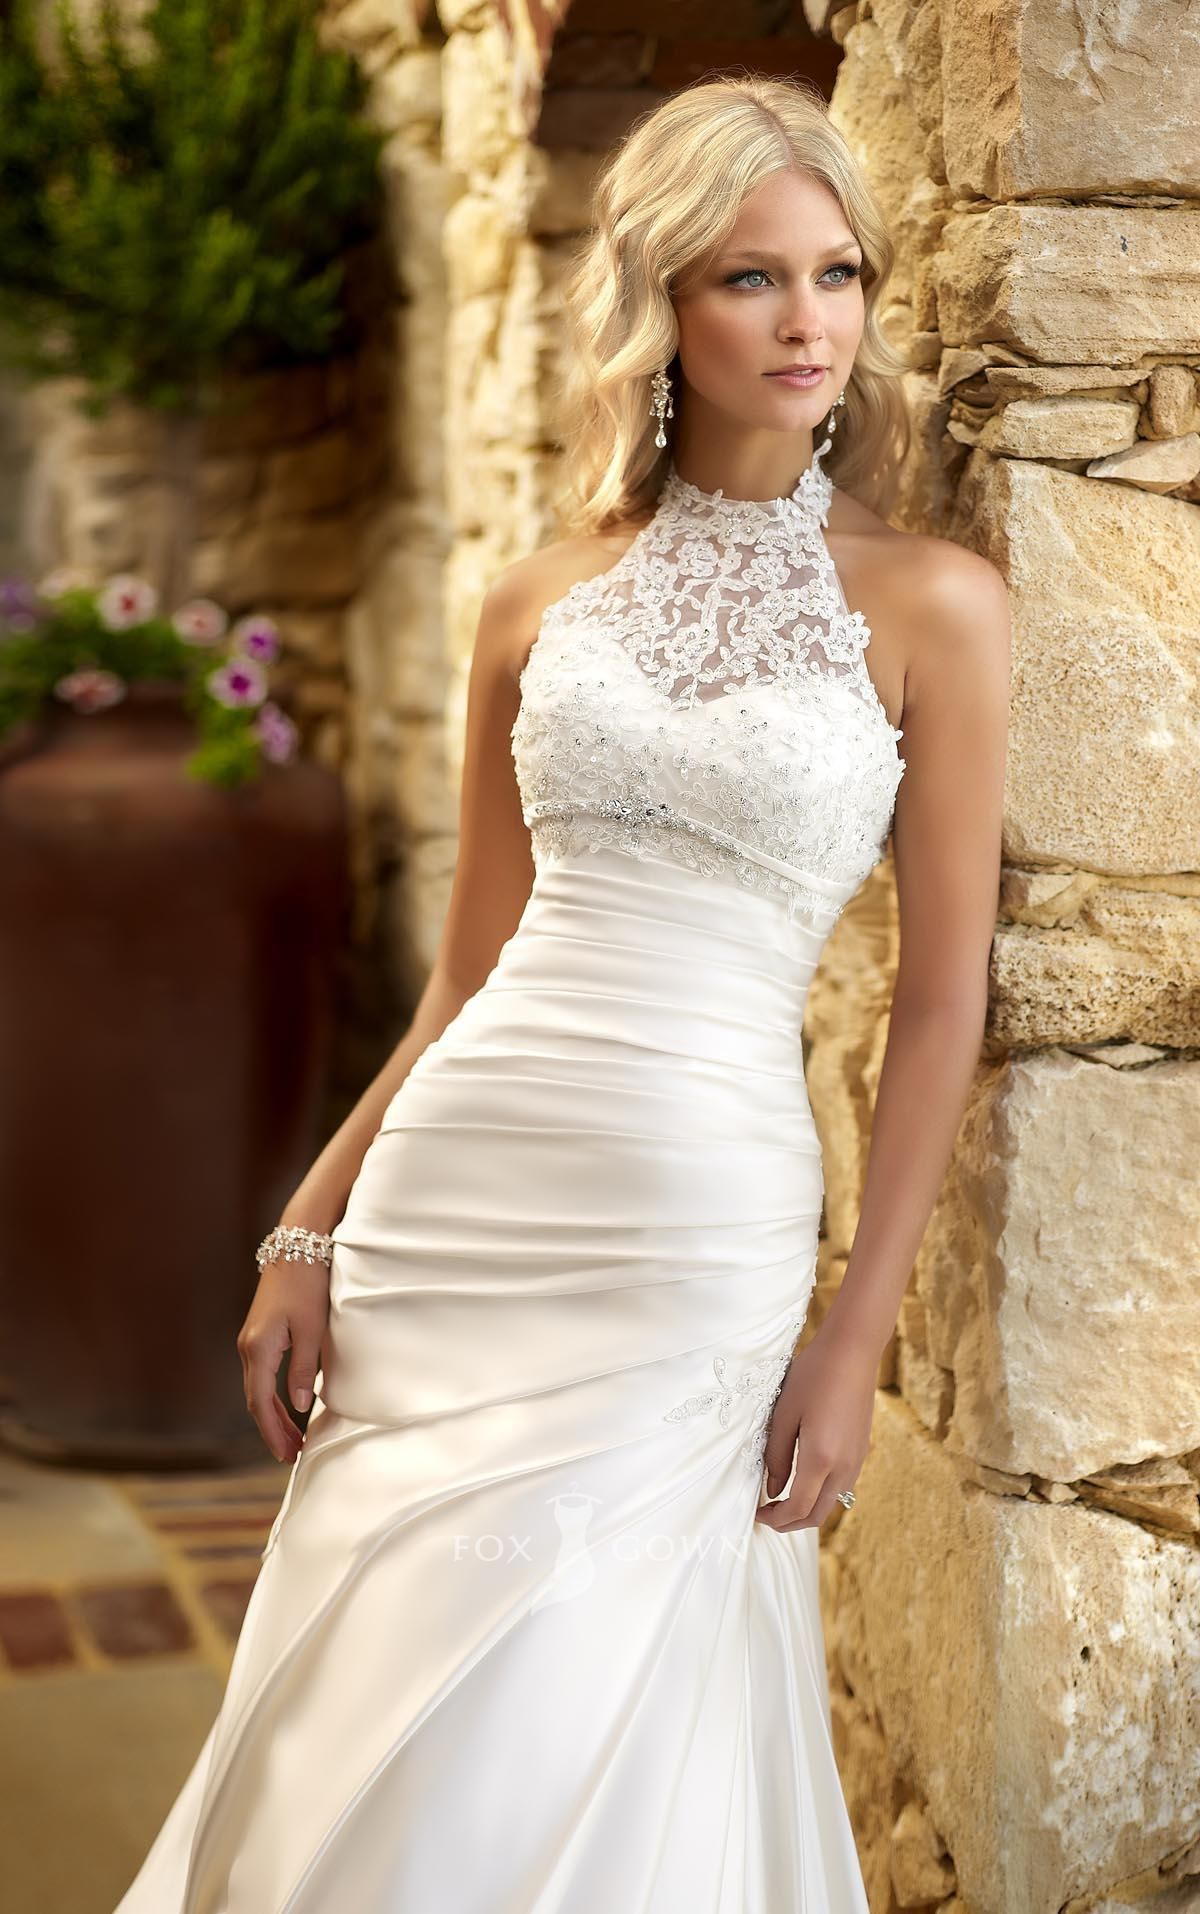 halter top wedding dresses 22 Must See Spring Wedding Dress Trends